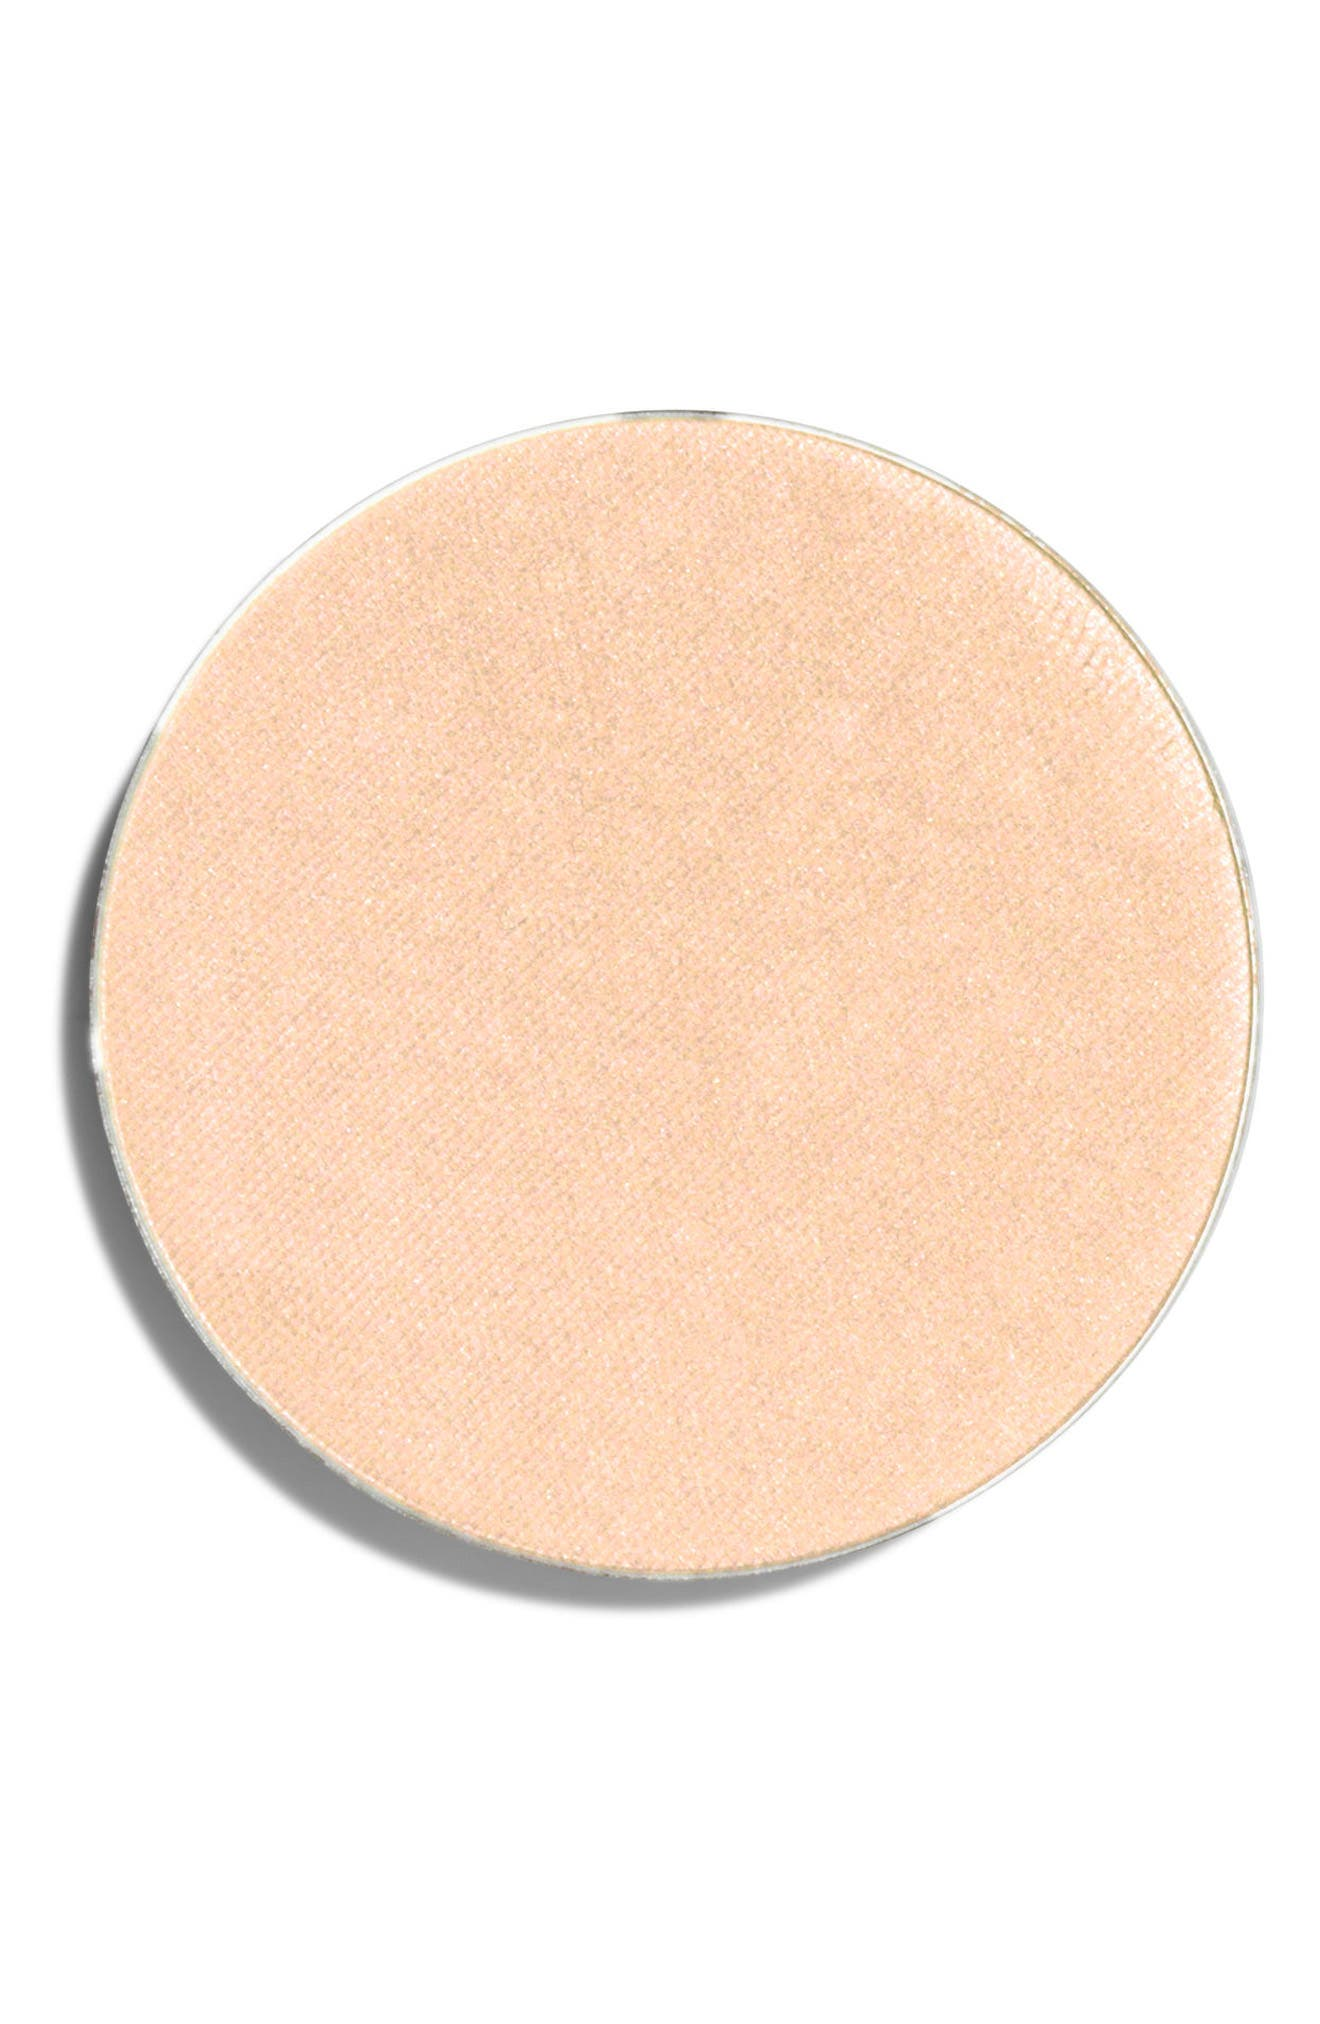 CHANTECAILLE Lasting Eye Shade Refill, Main, color, OPAL